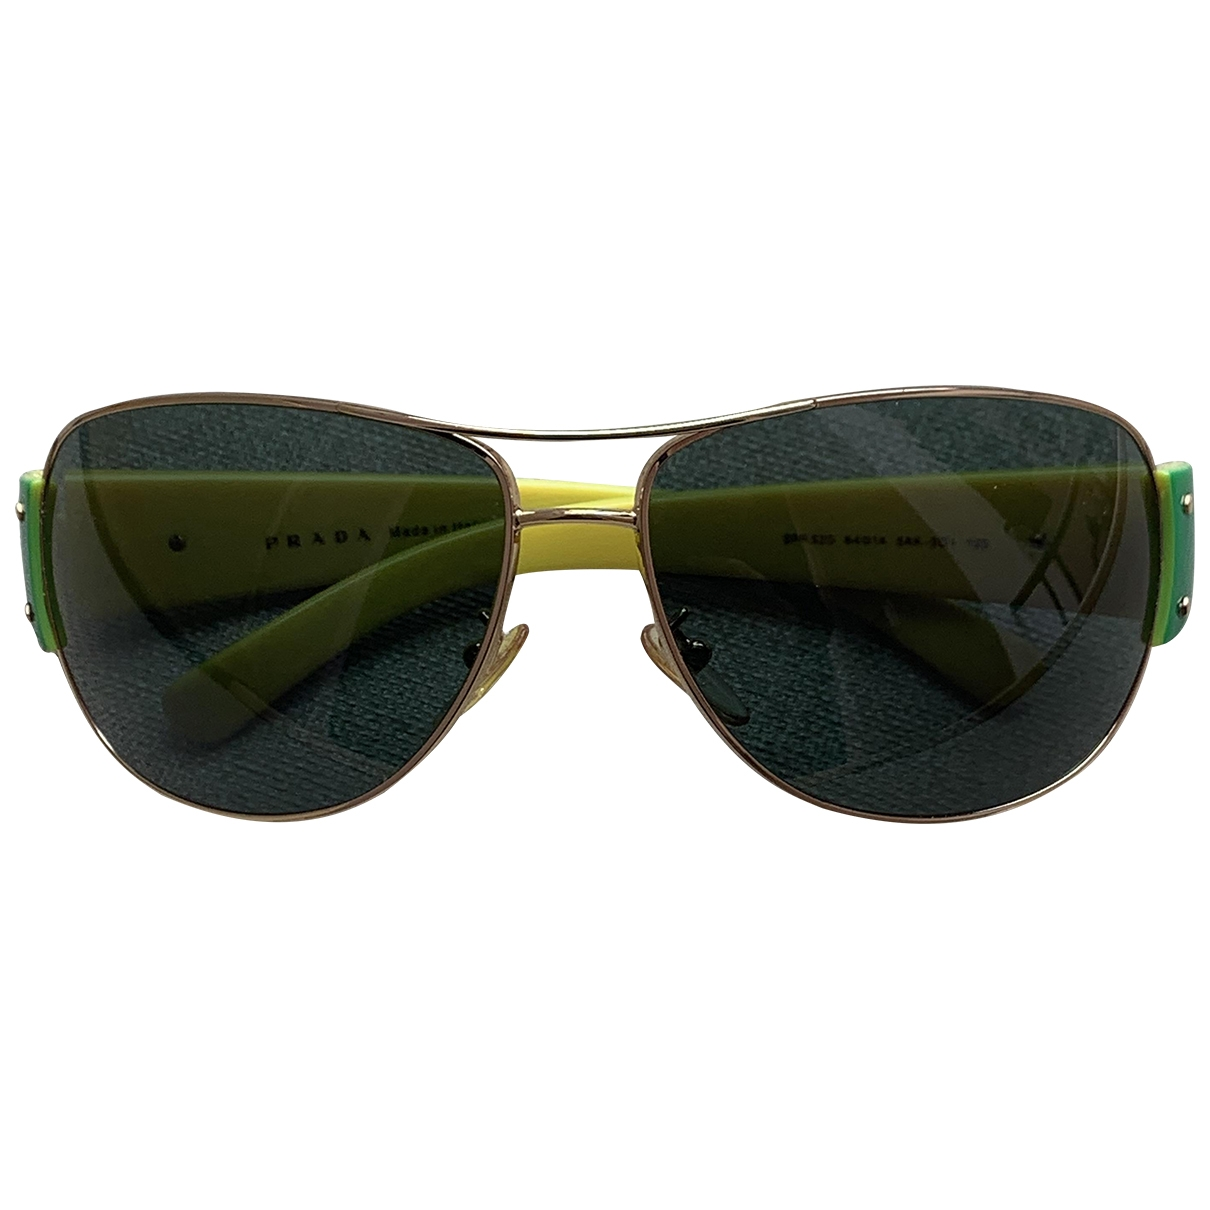 Prada \N Sonnenbrillen in  Bunt Metall